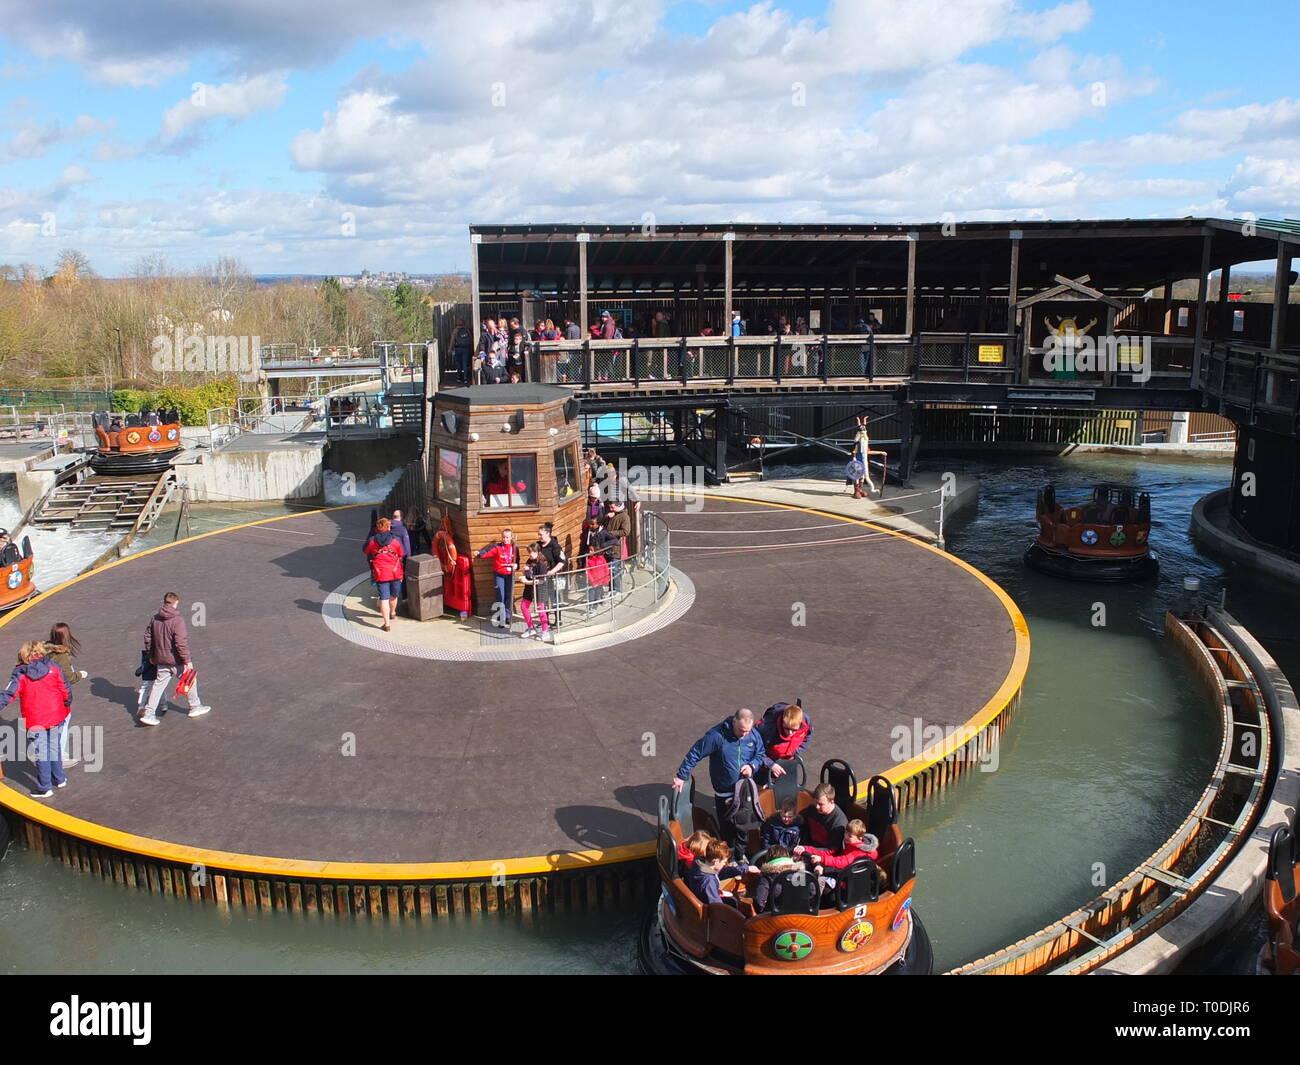 Legoland Windsor Resort UK - Viking's River Splash water ride in 'The Land Of The Vikings' section Stock Photo